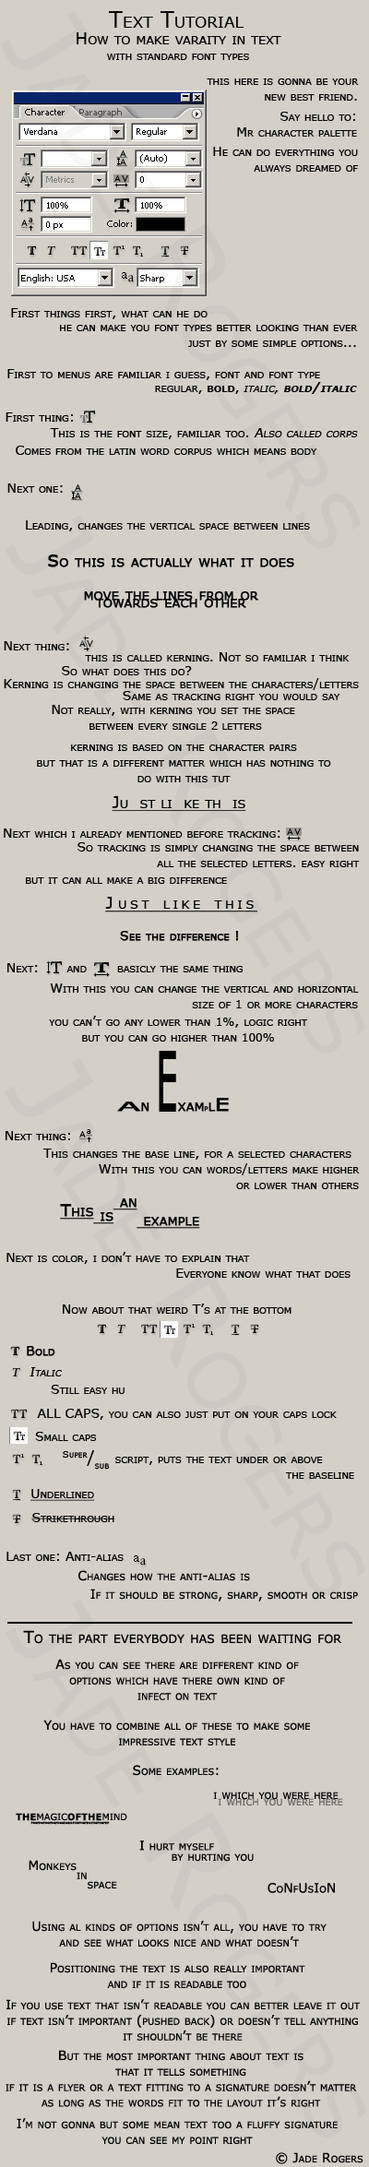 Text tutorial